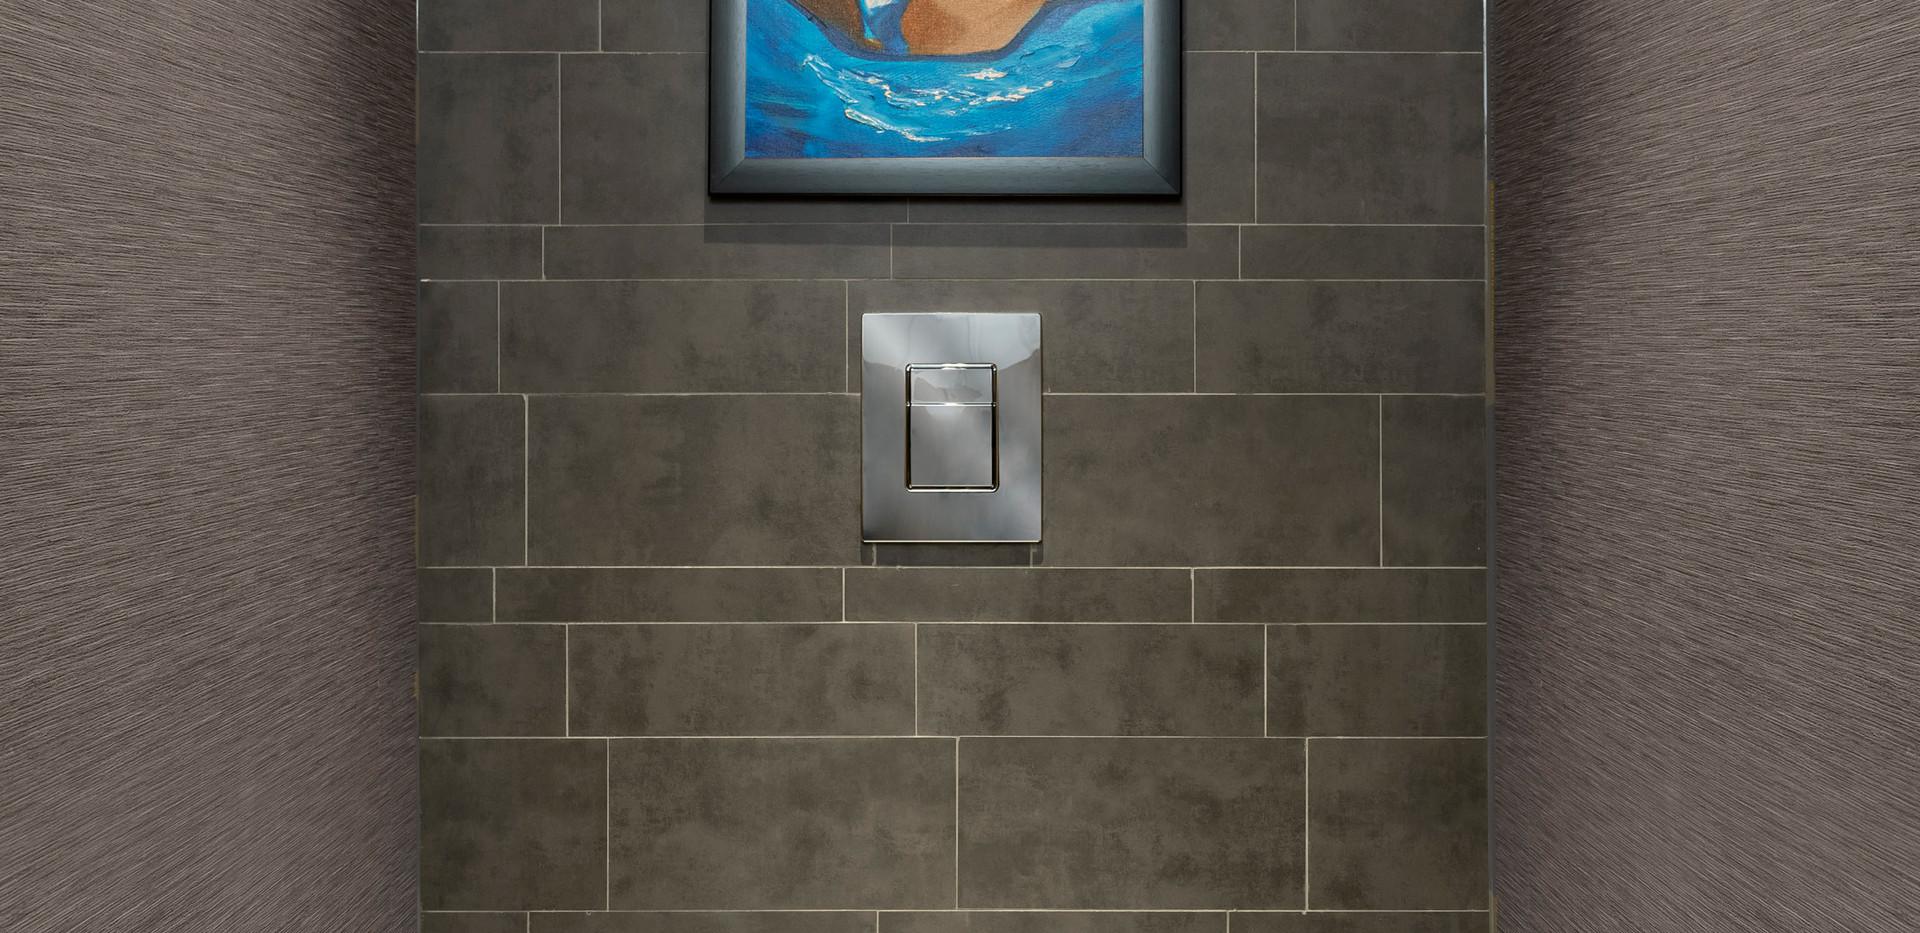 Room Bathroom - 13 - F Blok Mavi.jpg